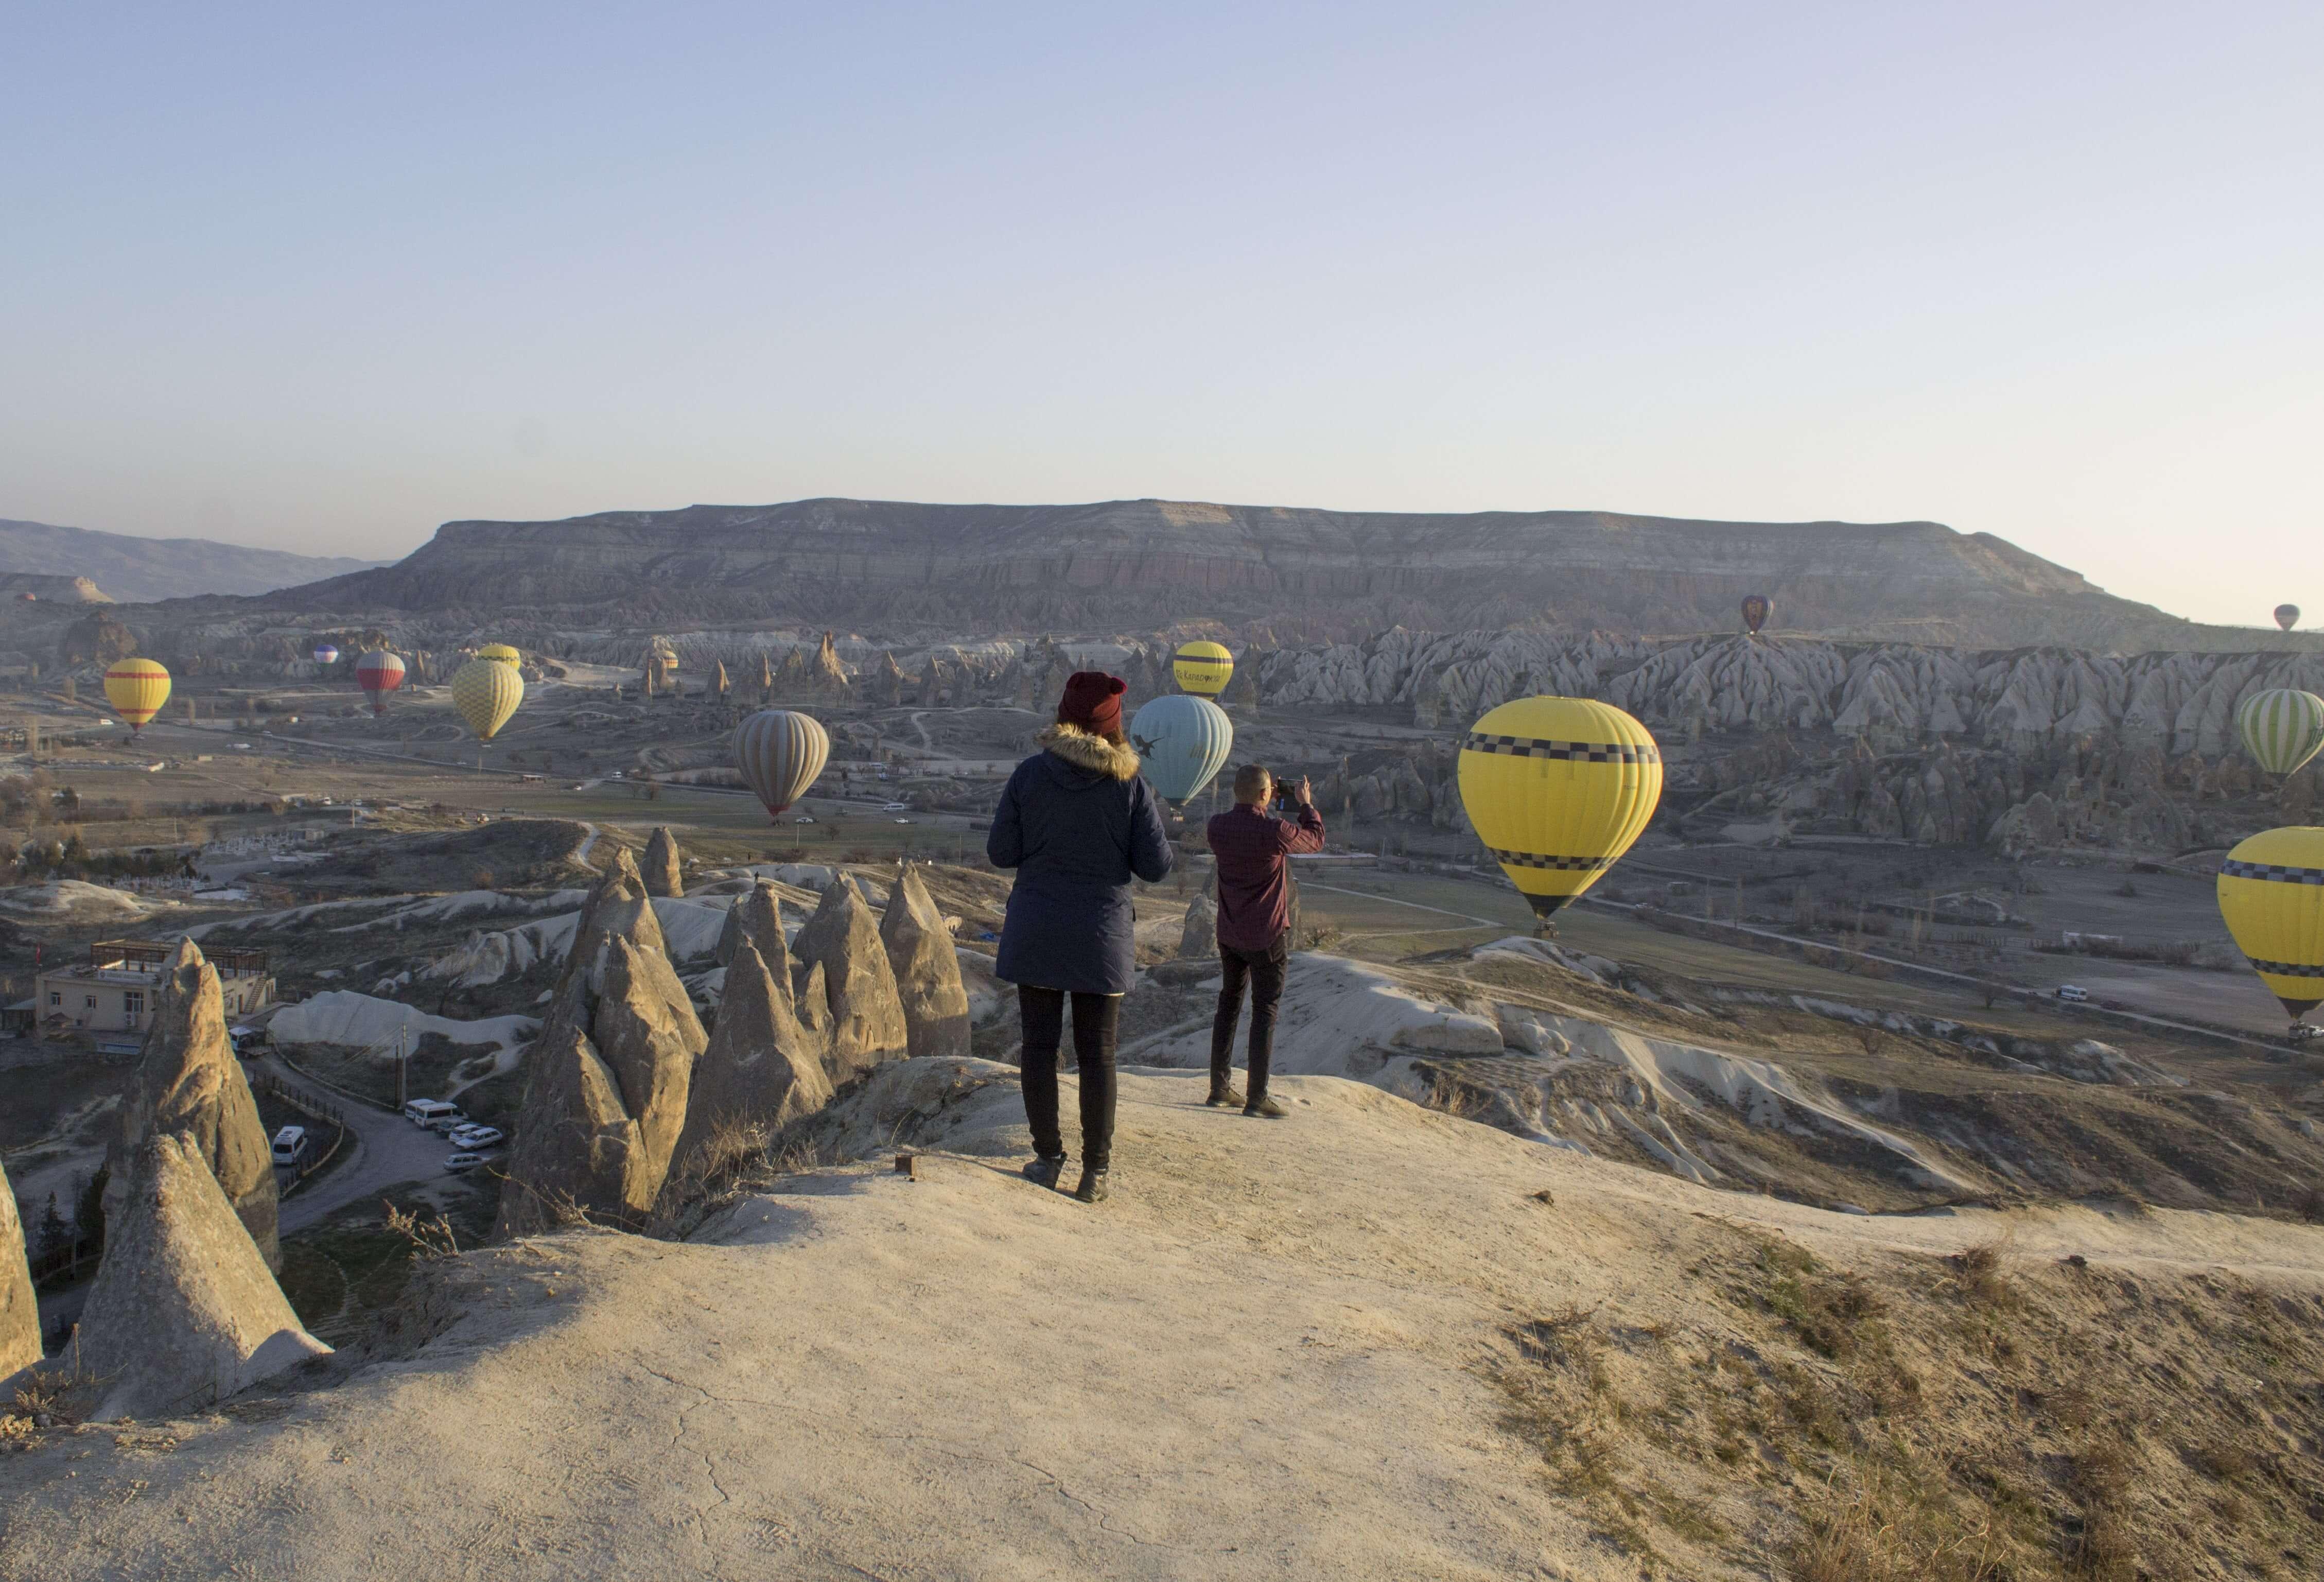 Cappadocia hot air balloons at sunrise point in Goreme